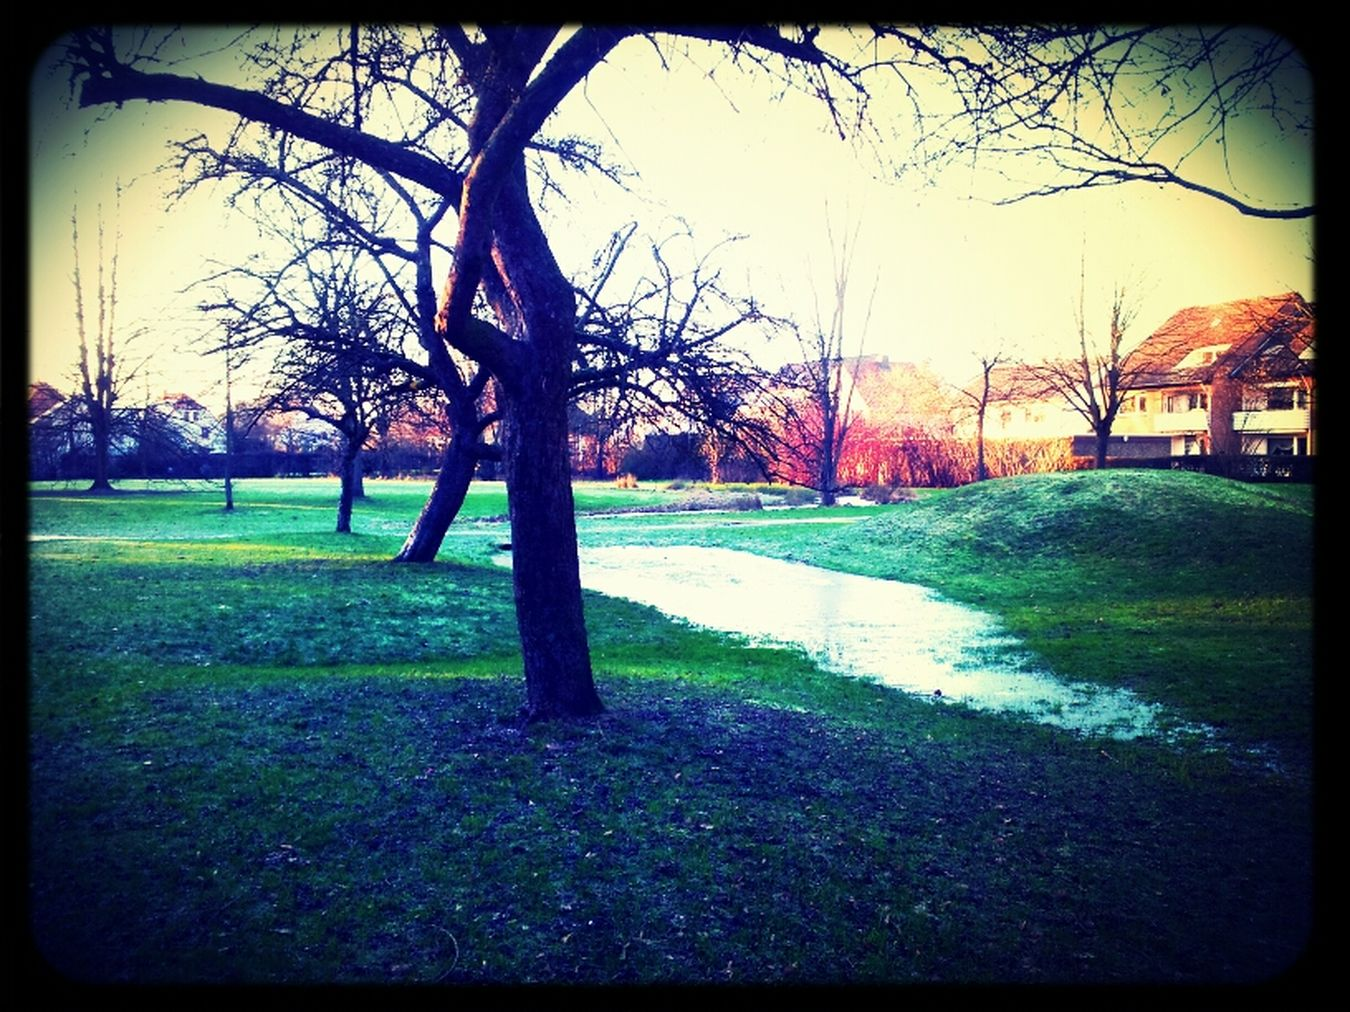 Streetphotography Nature Trees Park BTM Mvn